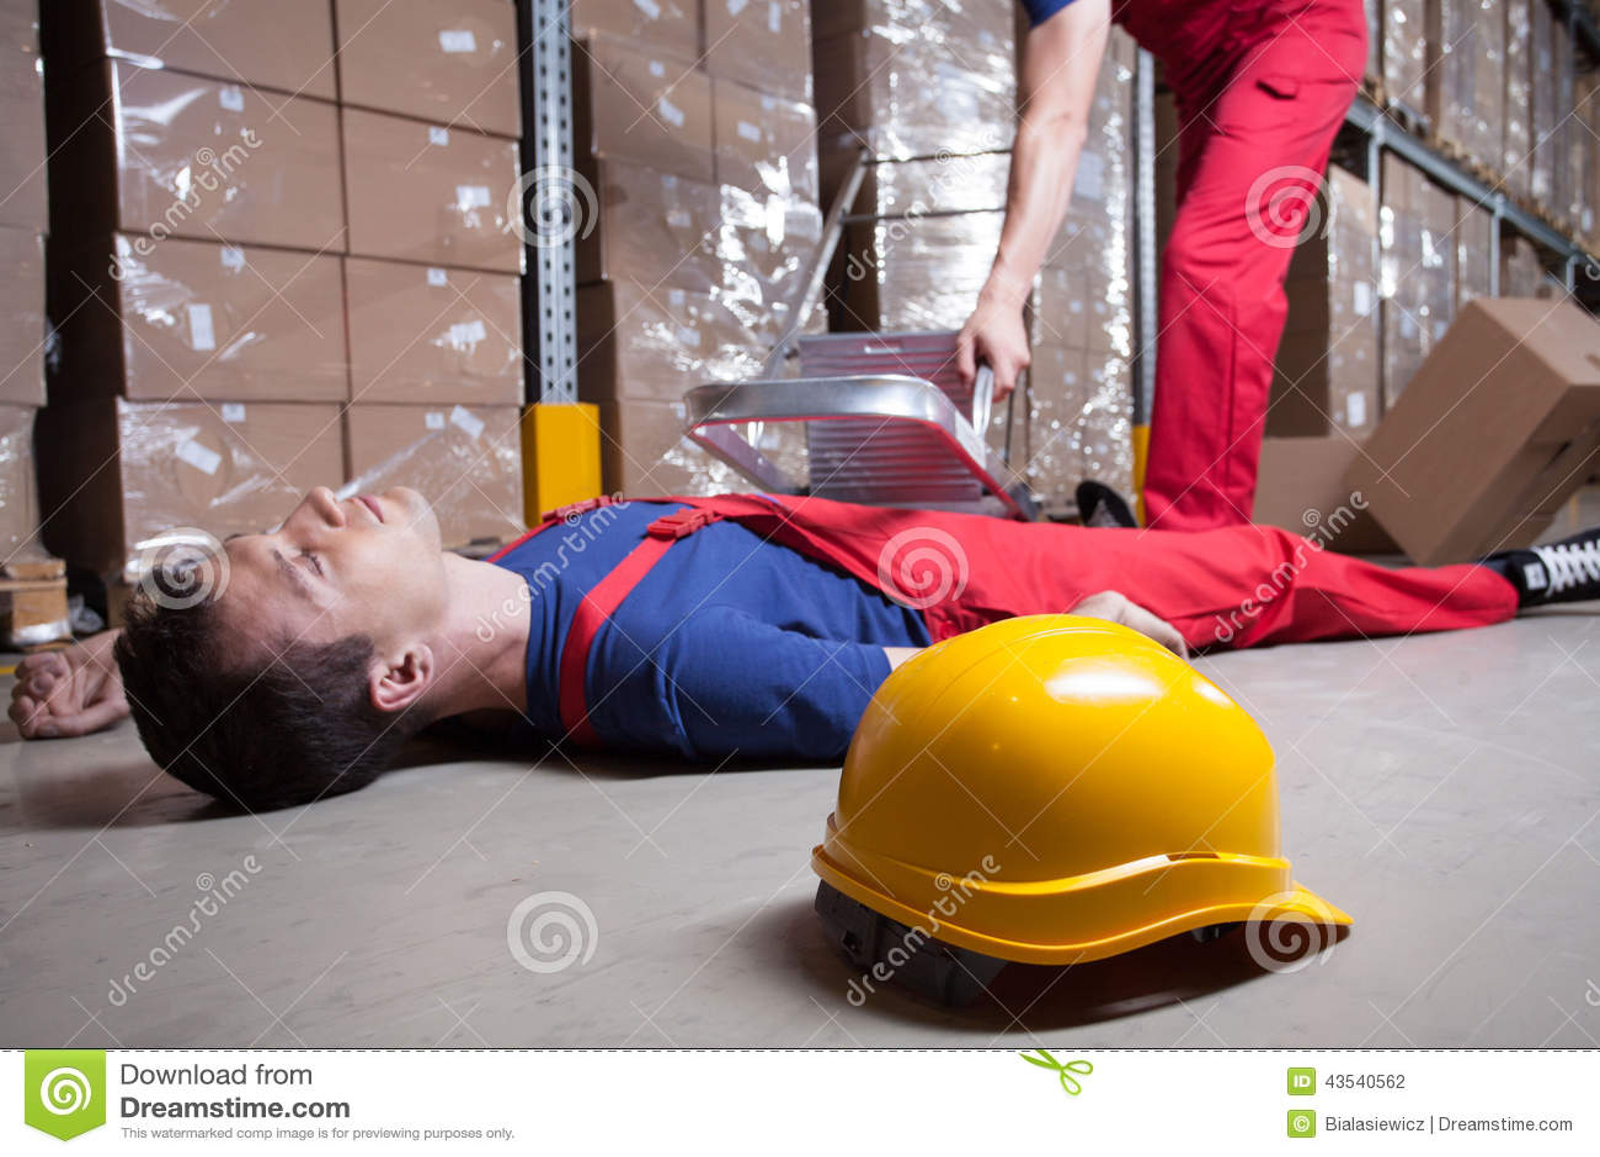 Wypadek w fabryce